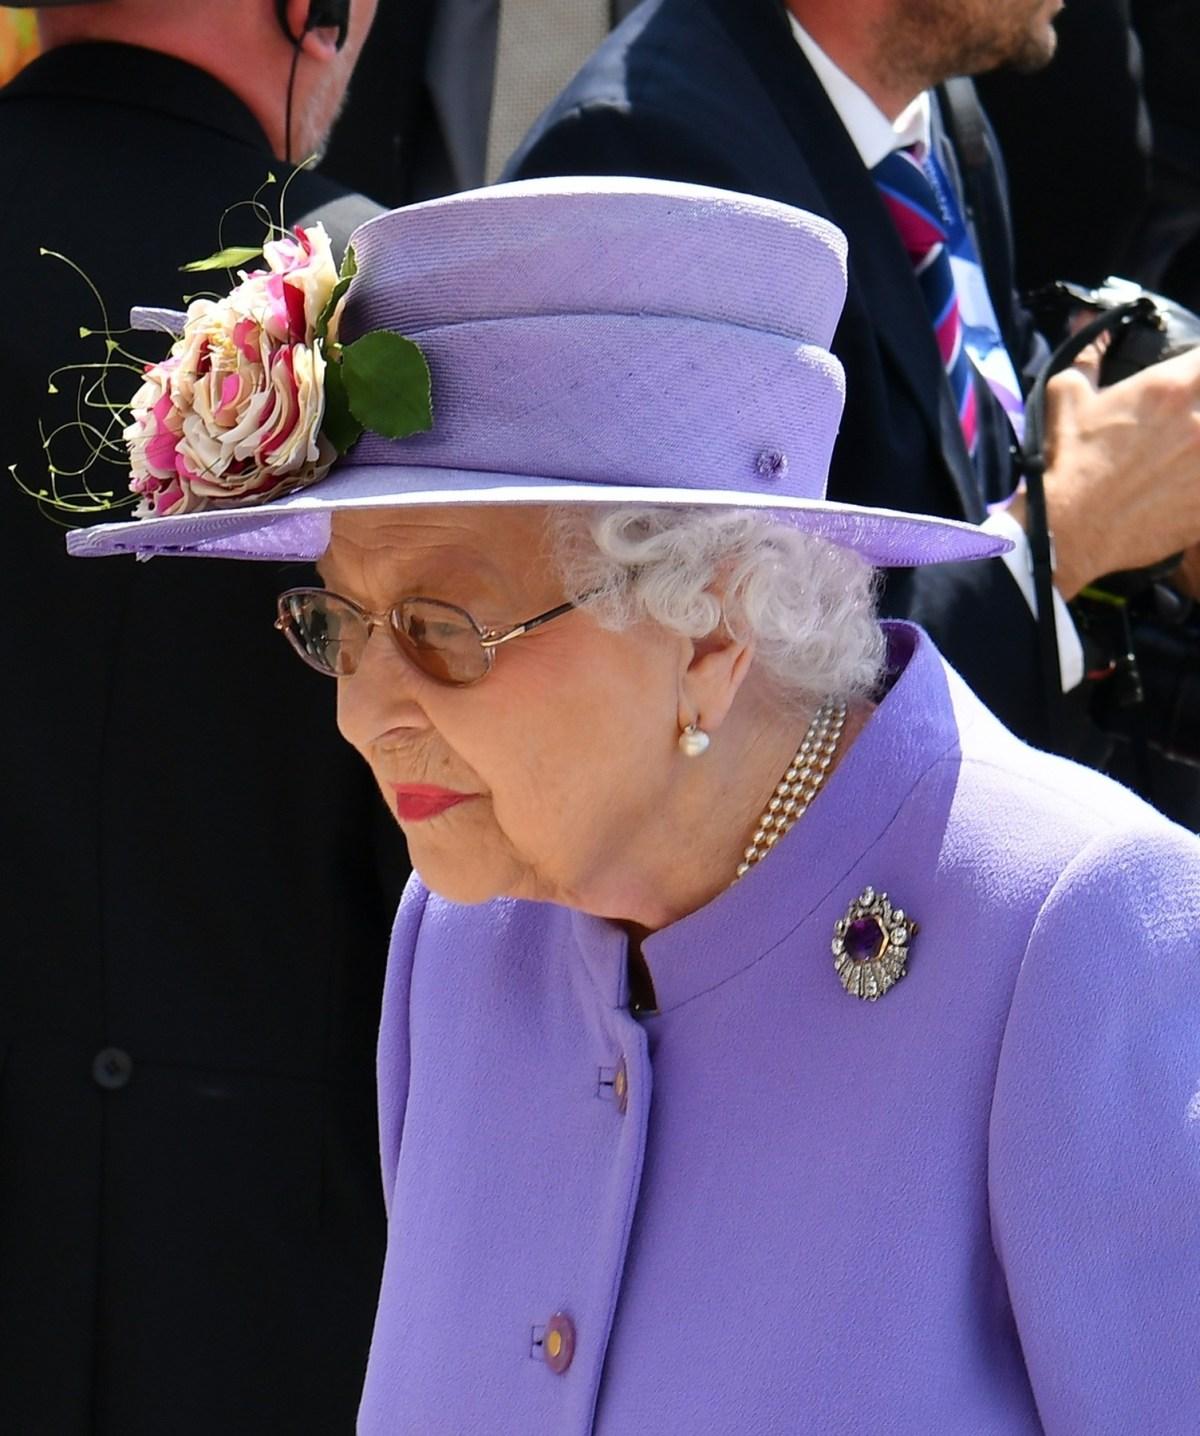 BGUK_1251062 - Epsom, UJEDINJENO KRALJEVSTVO - Nj.KV Kraljica Elizabeta II na slici je prisustvovala Investec derbi festivalu 2018 u Epsom Downsu.  Na slici: Queen Elizabeth II BACKGRID UK 2. JUNA 2018., Slika: 373639497, Licenca: Upravljano pravima, Ograničenja :, Izdanje modela: ne, Kreditna linija: ANCL / Backgrid UK / Profimedia